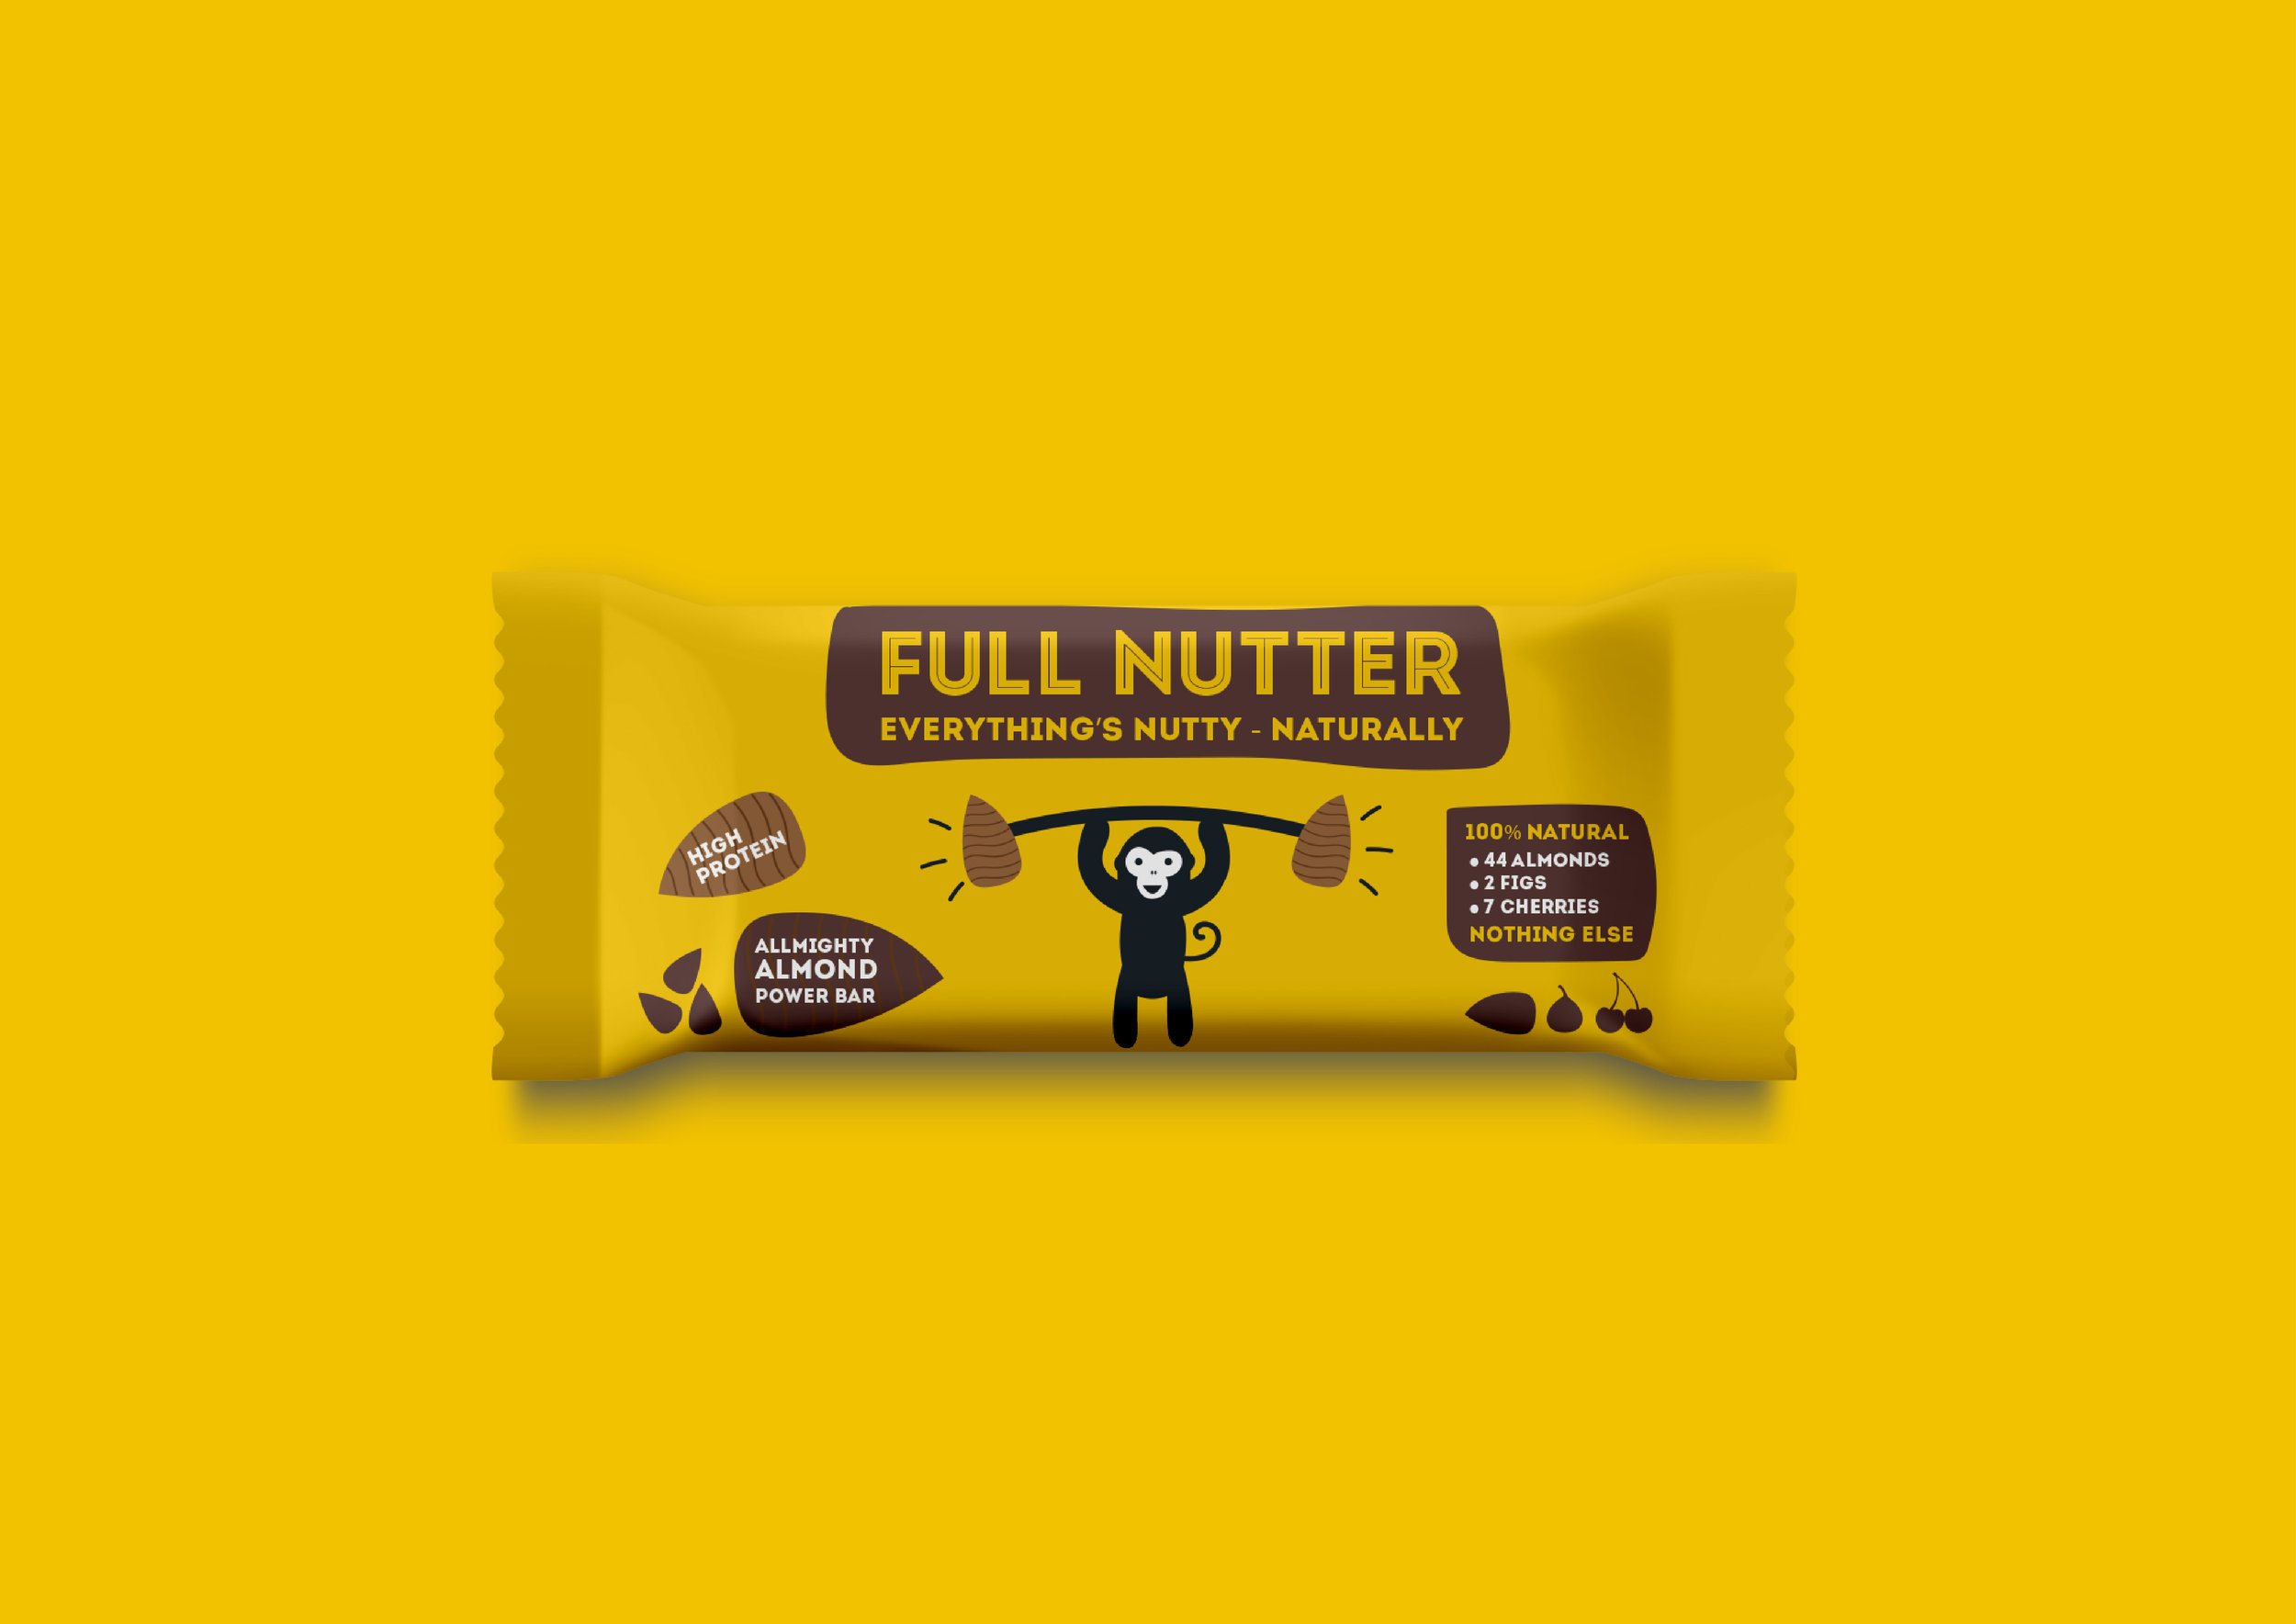 Full nutter health food packaging design and illustration